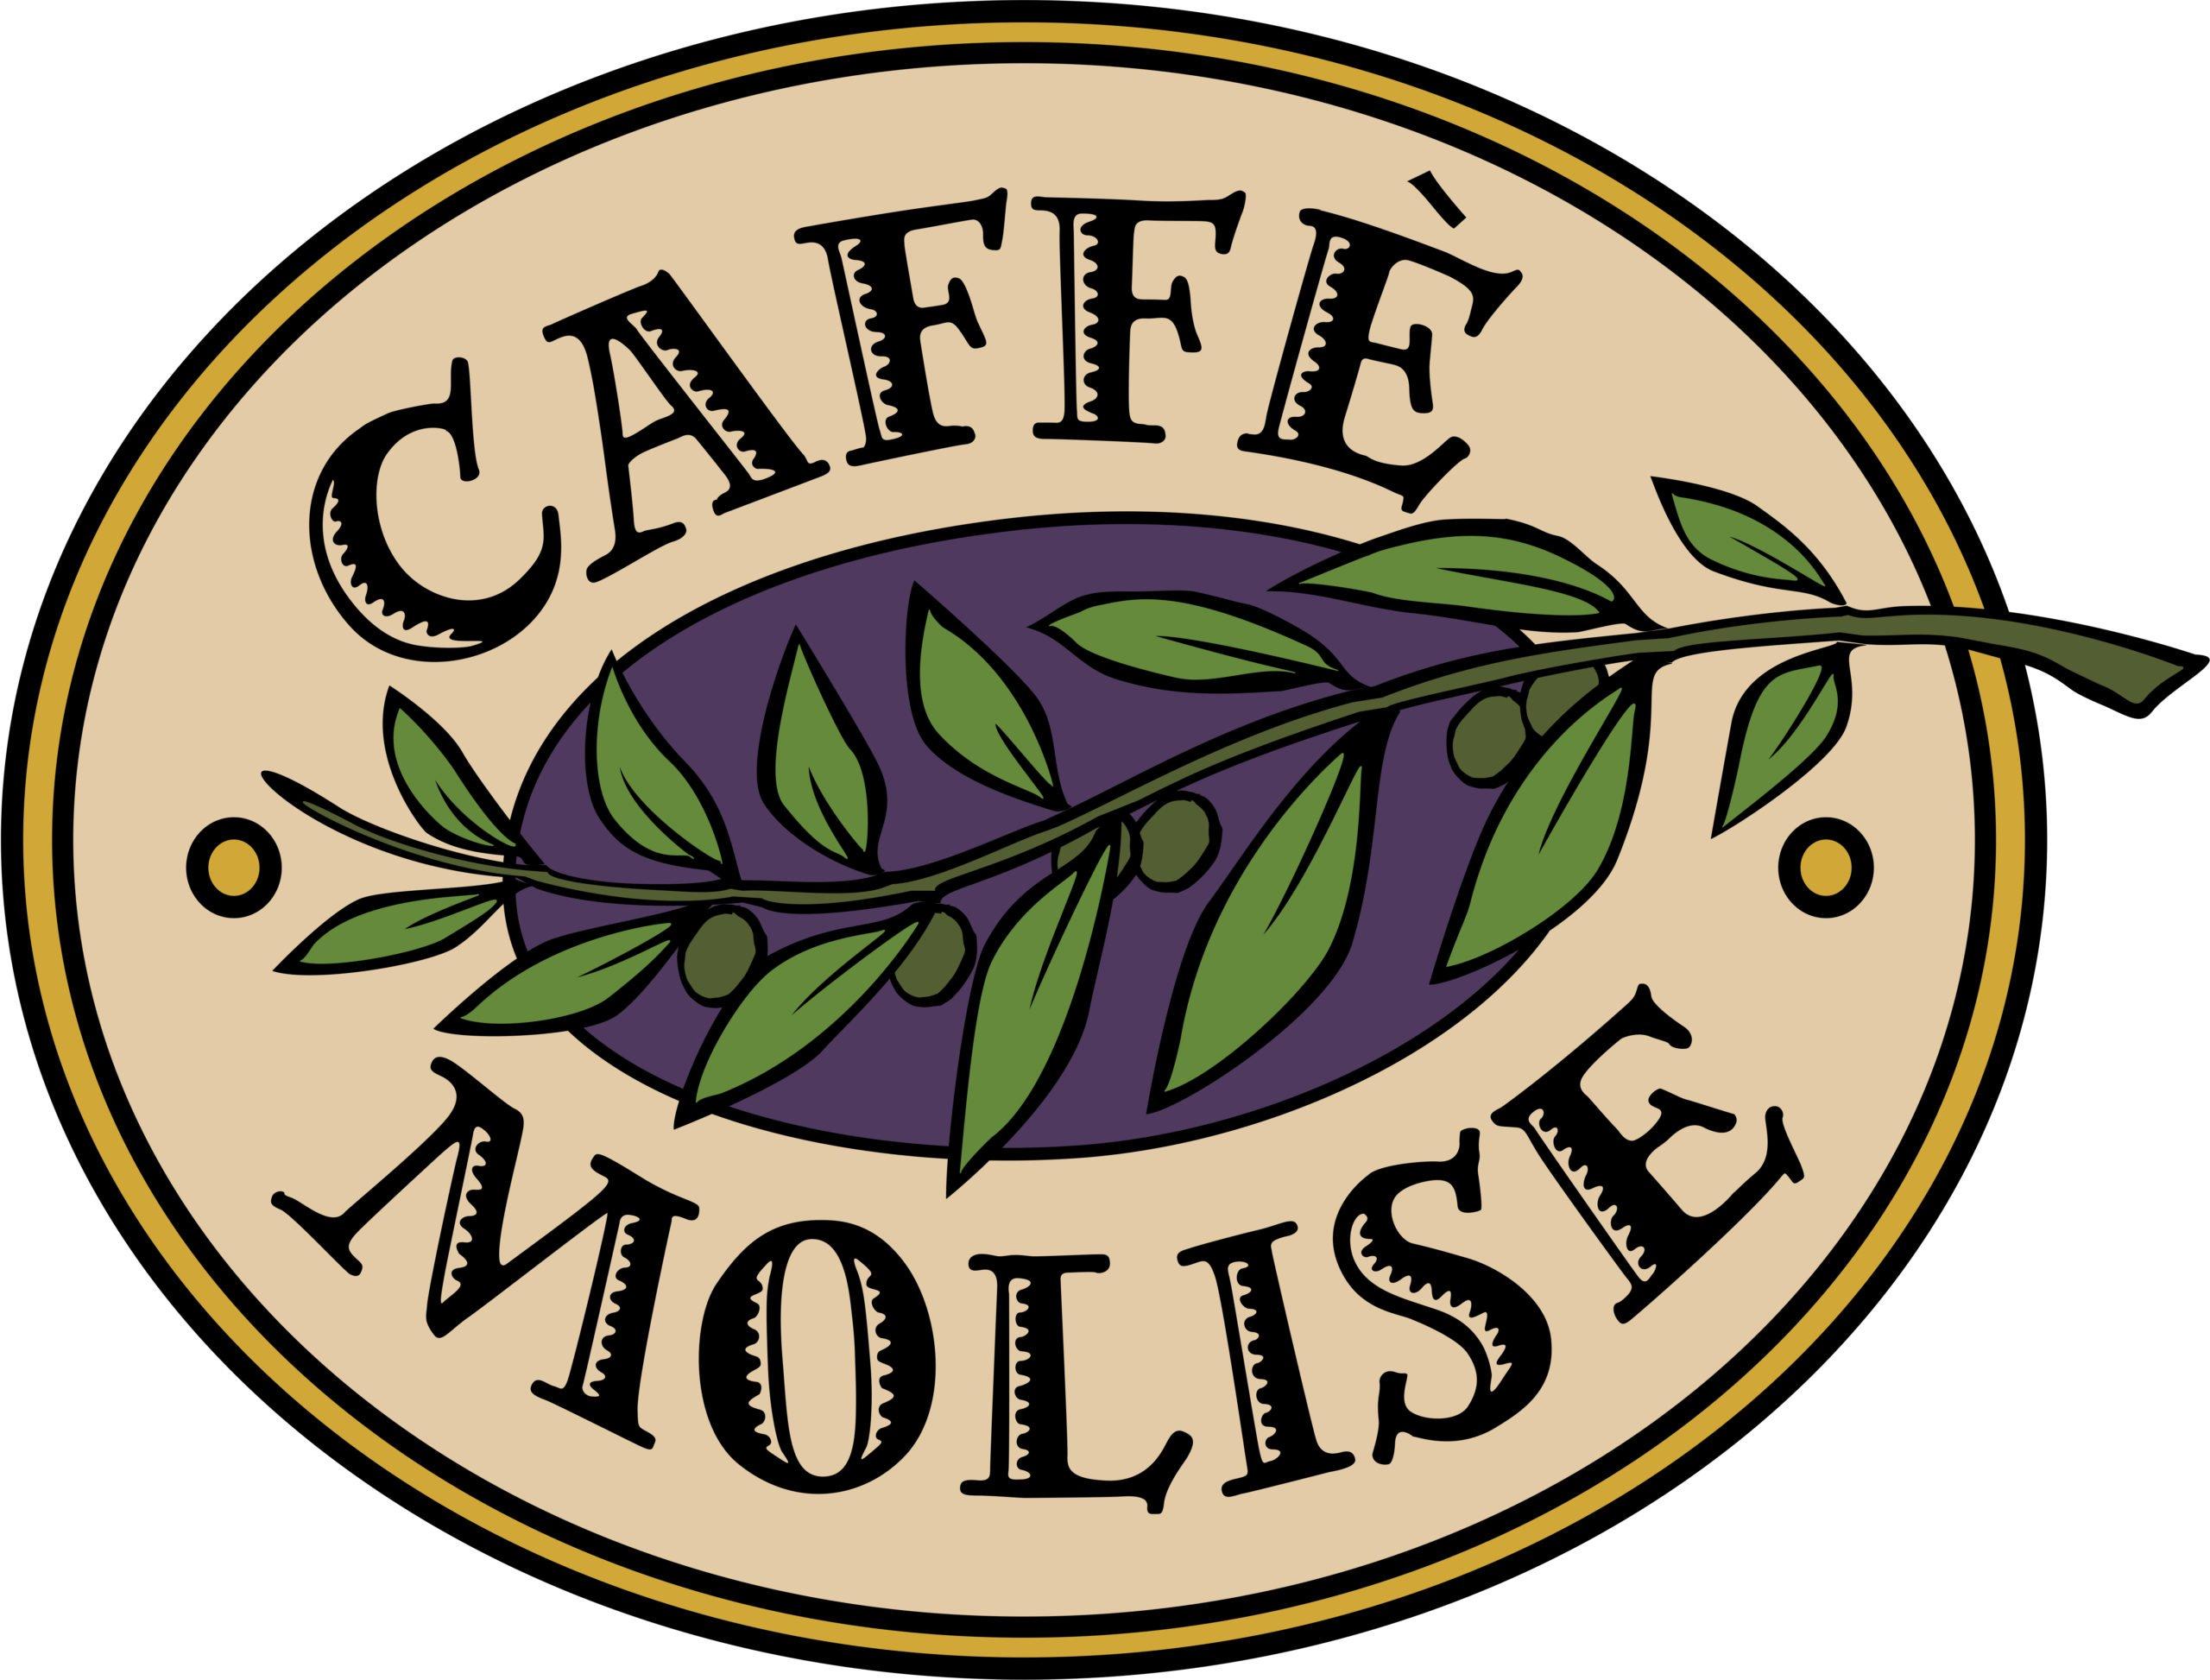 Caffe Molise